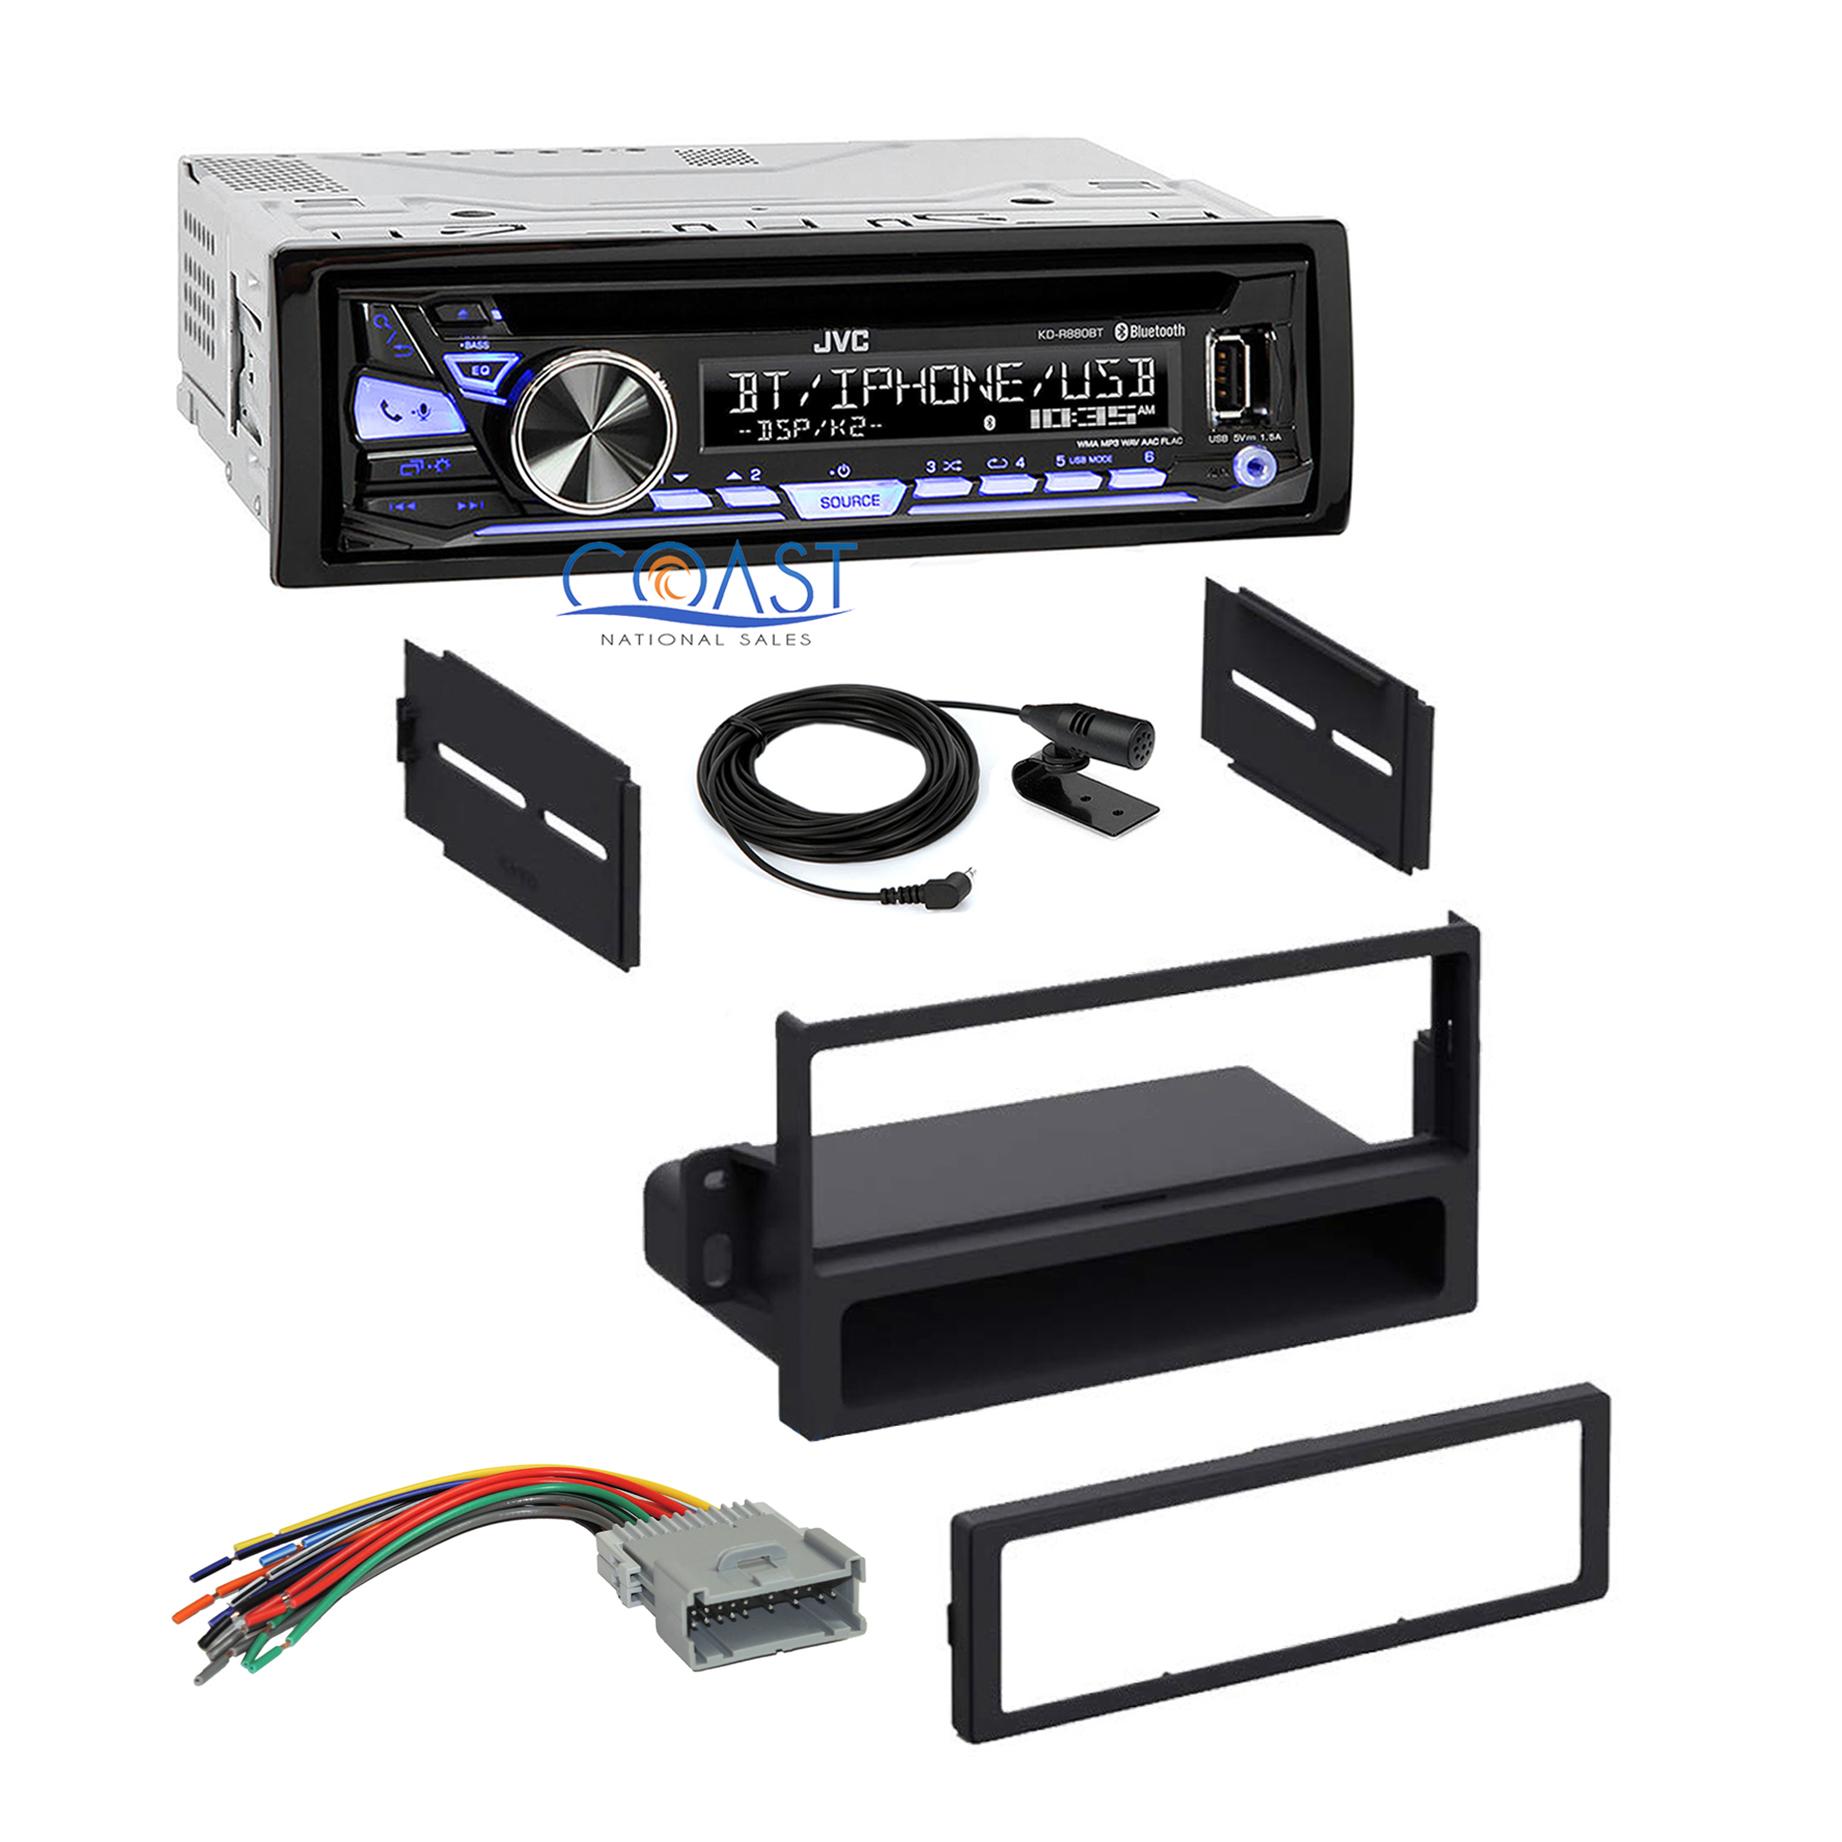 jvc bluetooth car radio stereo dash kit harness for 2000. Black Bedroom Furniture Sets. Home Design Ideas